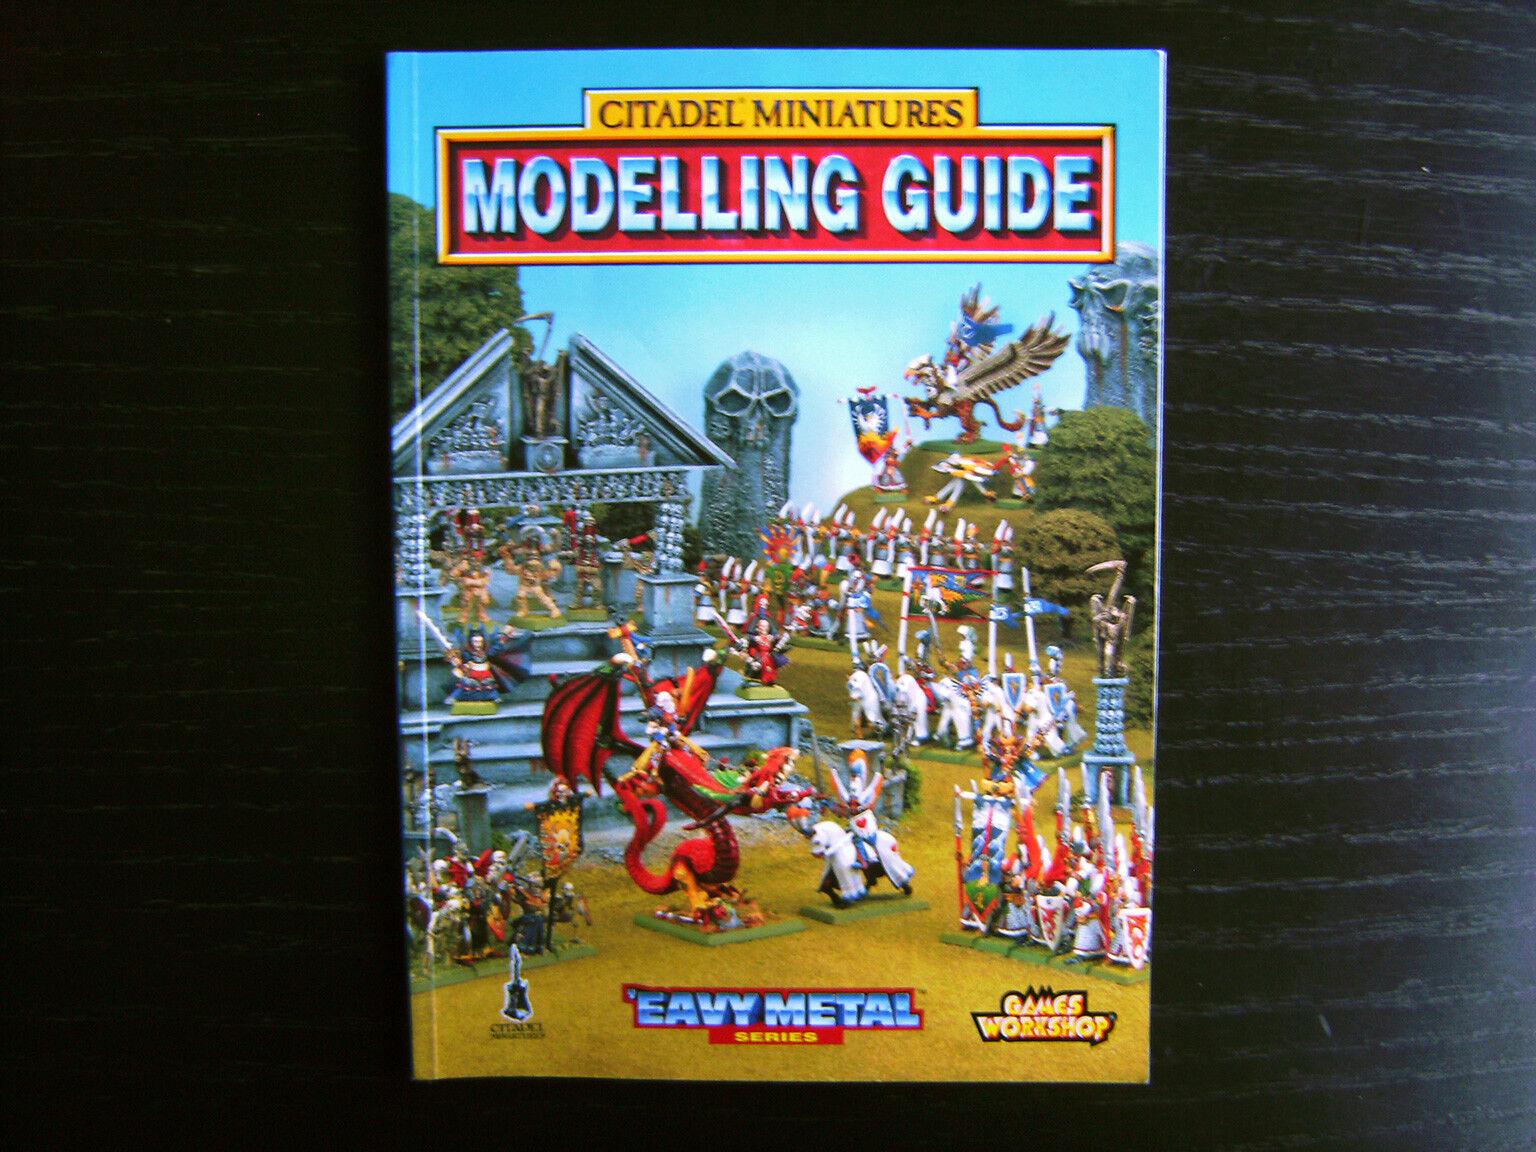 'Eavy Metal - Citadel Miniatures Modelling Guide, 1994